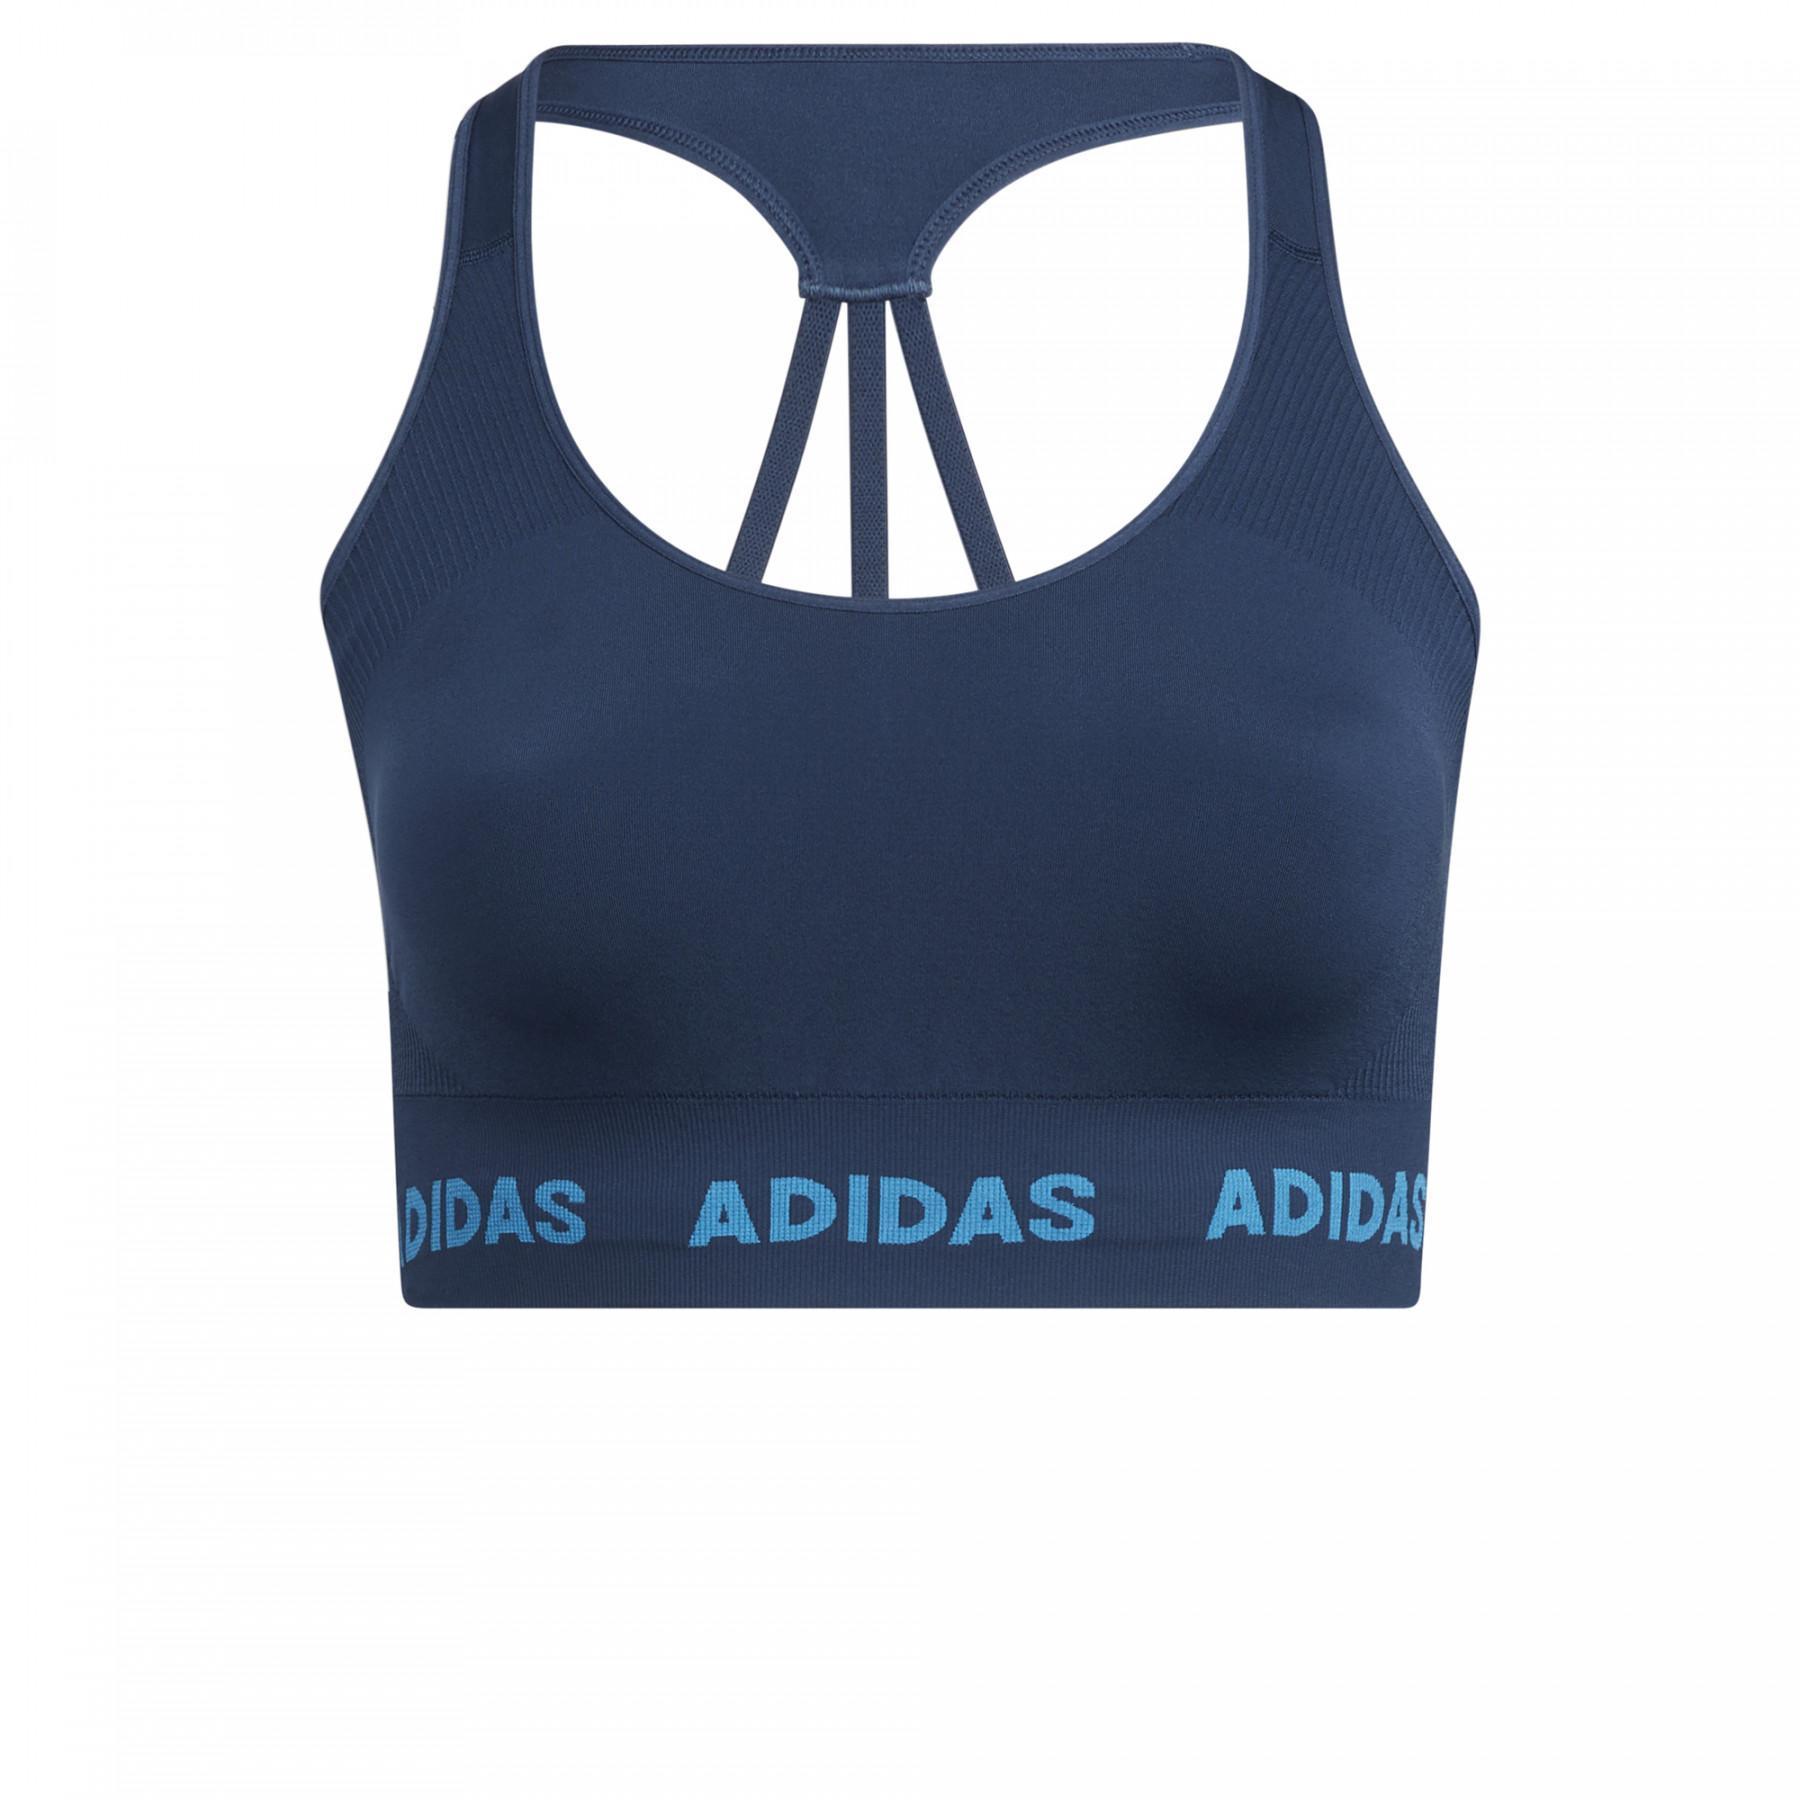 adidas Training Branded Aeroknitps Women's Bra